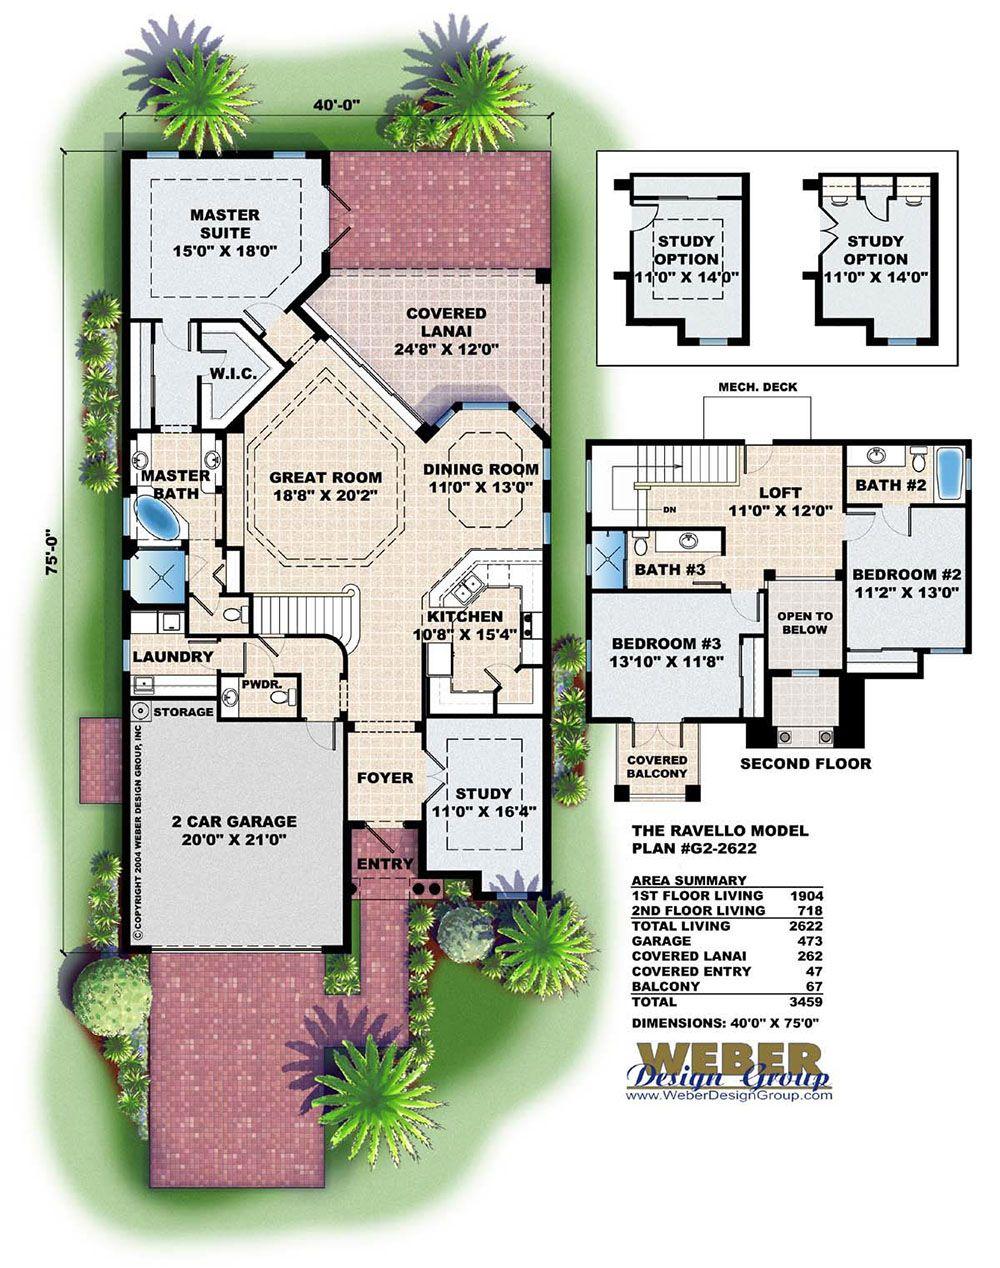 Mediterranean House Plan Luxury Contemporary Narrow Lot Home Plan Mediterranean House Plans Florida House Plans Mediterranean Floor Plans